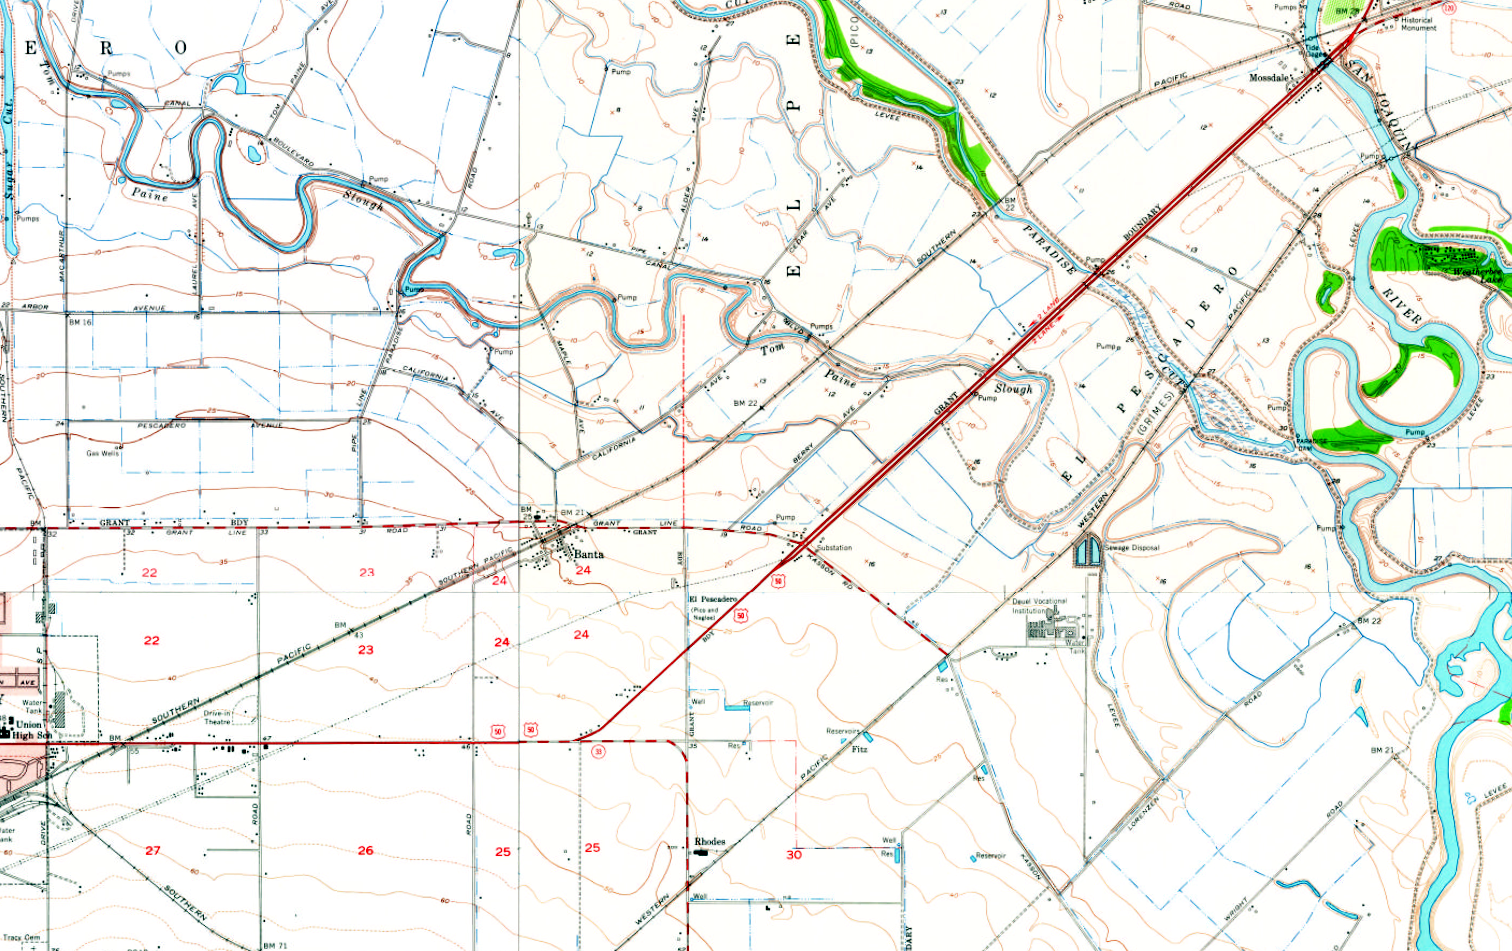 USGS Banta, Calif., Area Map